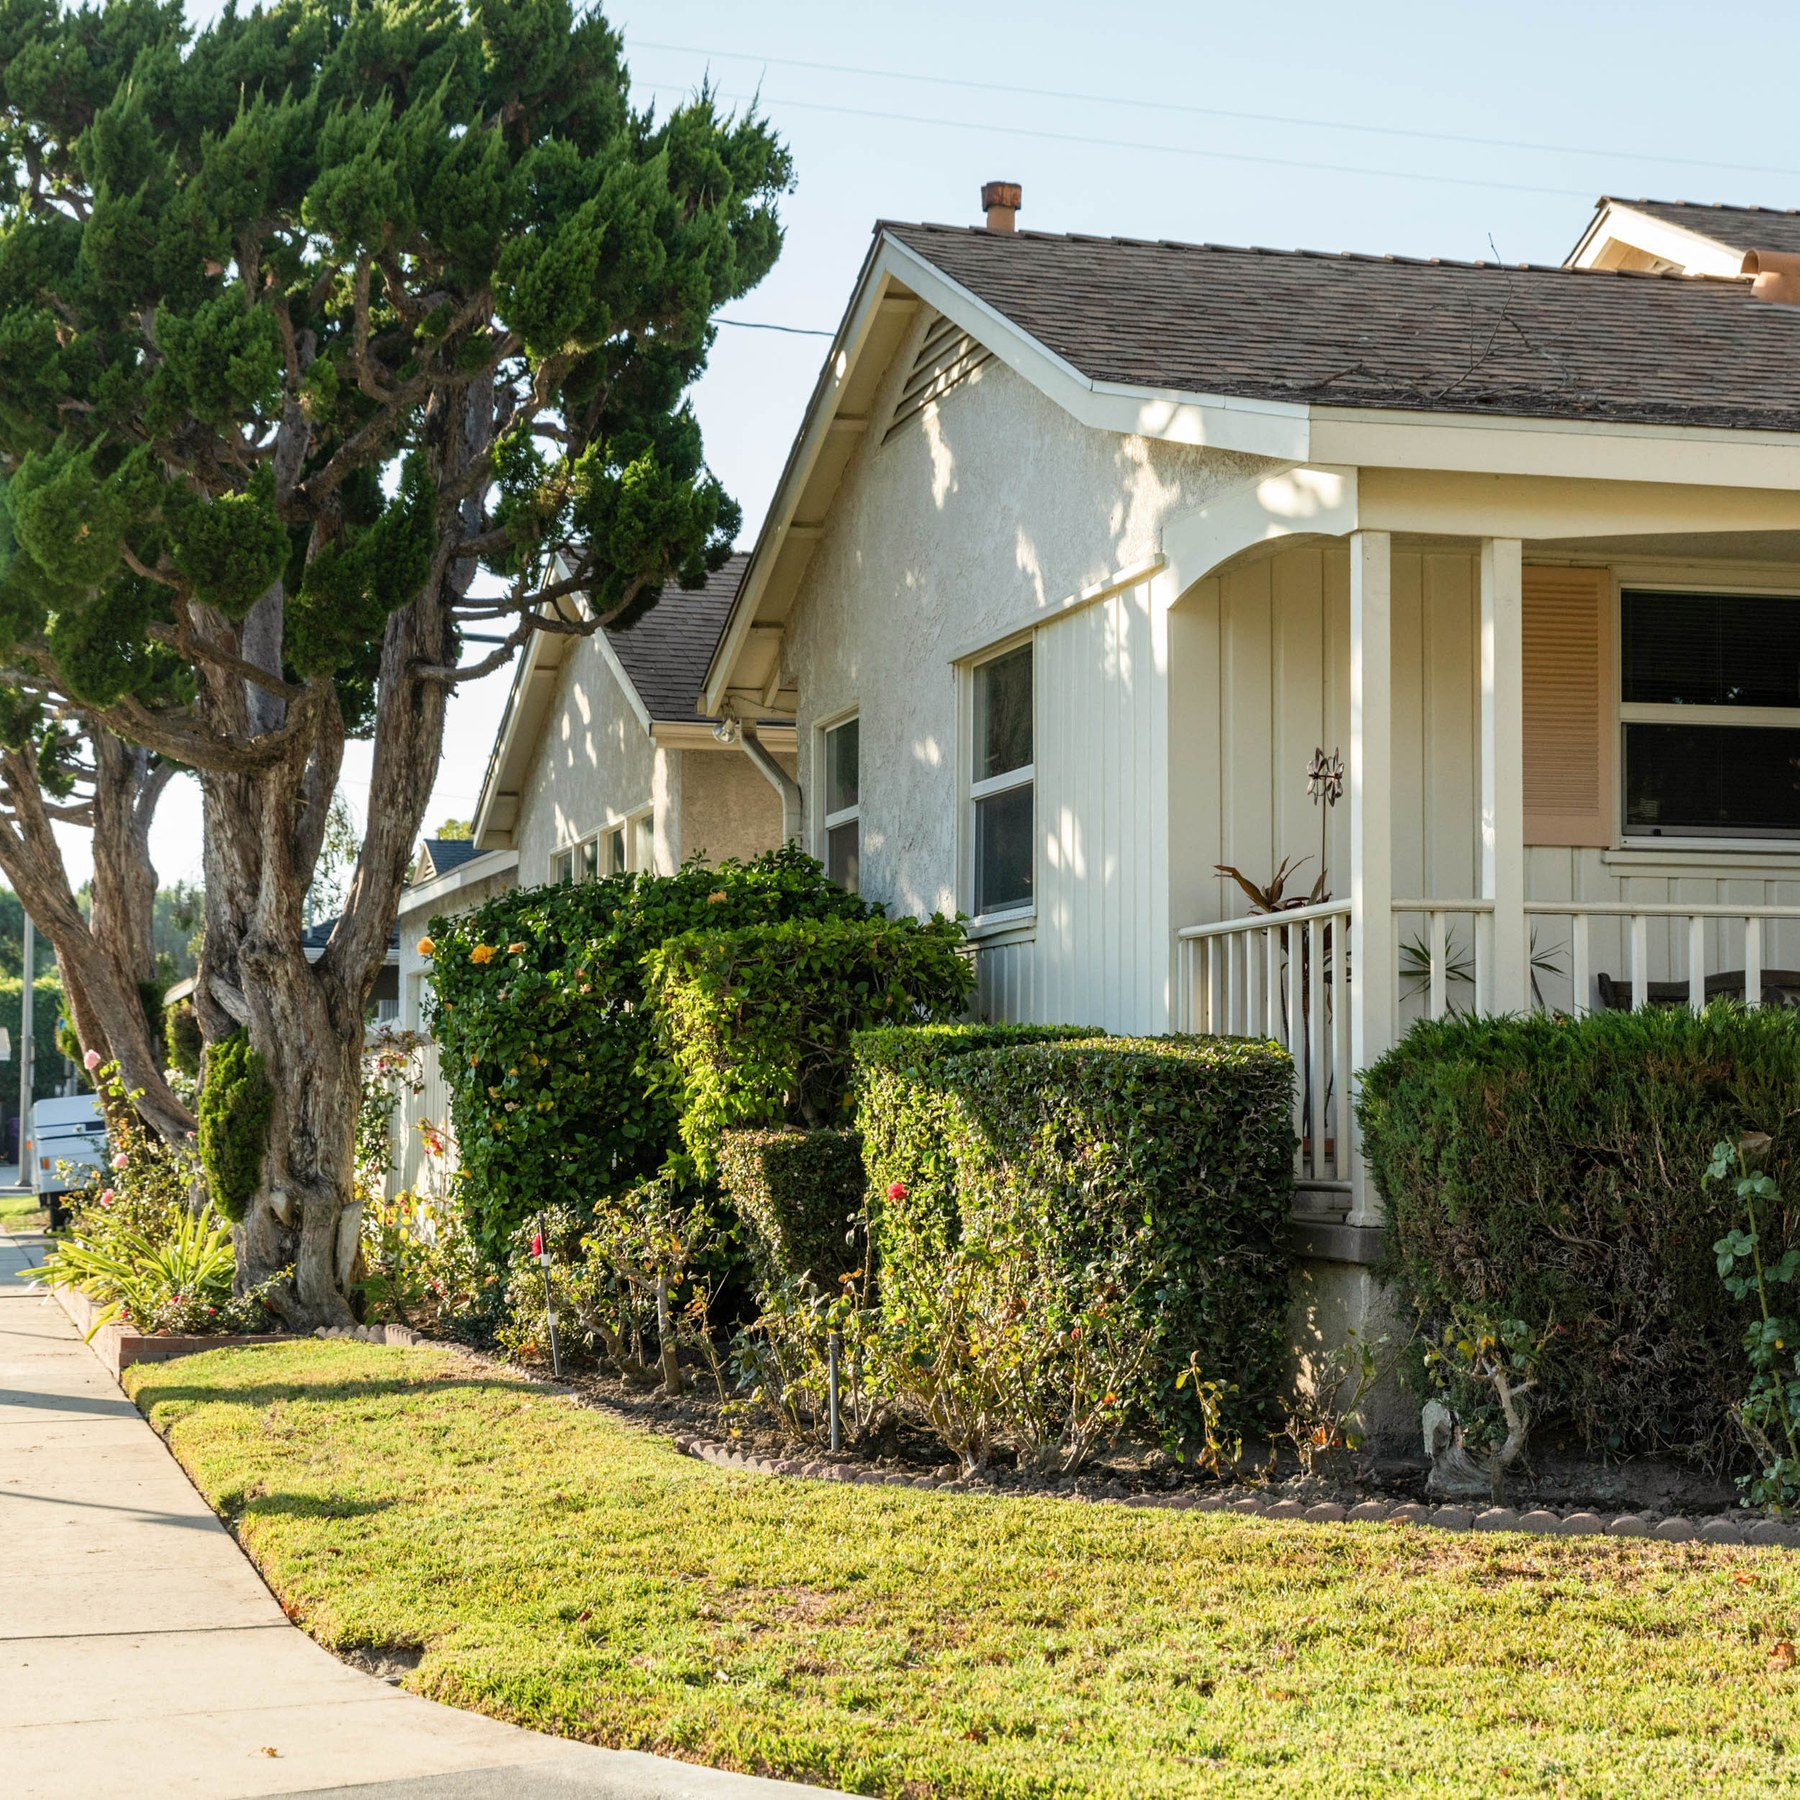 The Plaza, Long Beach CA - Neighborhood Guide